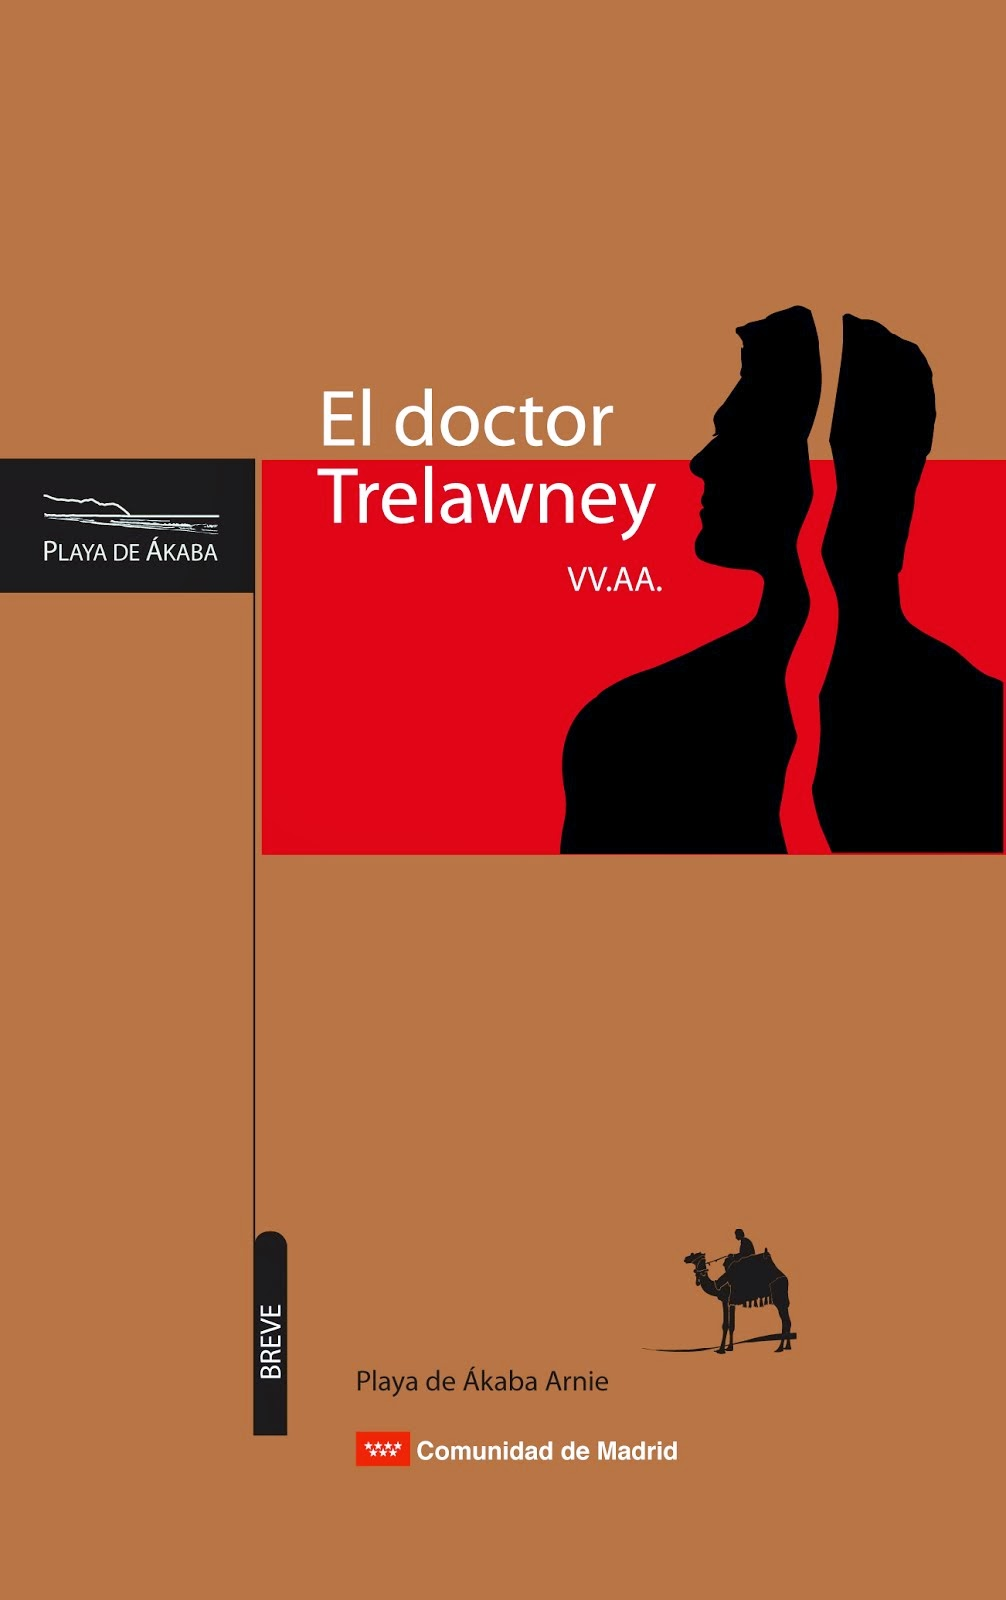 El doctor Trelawney